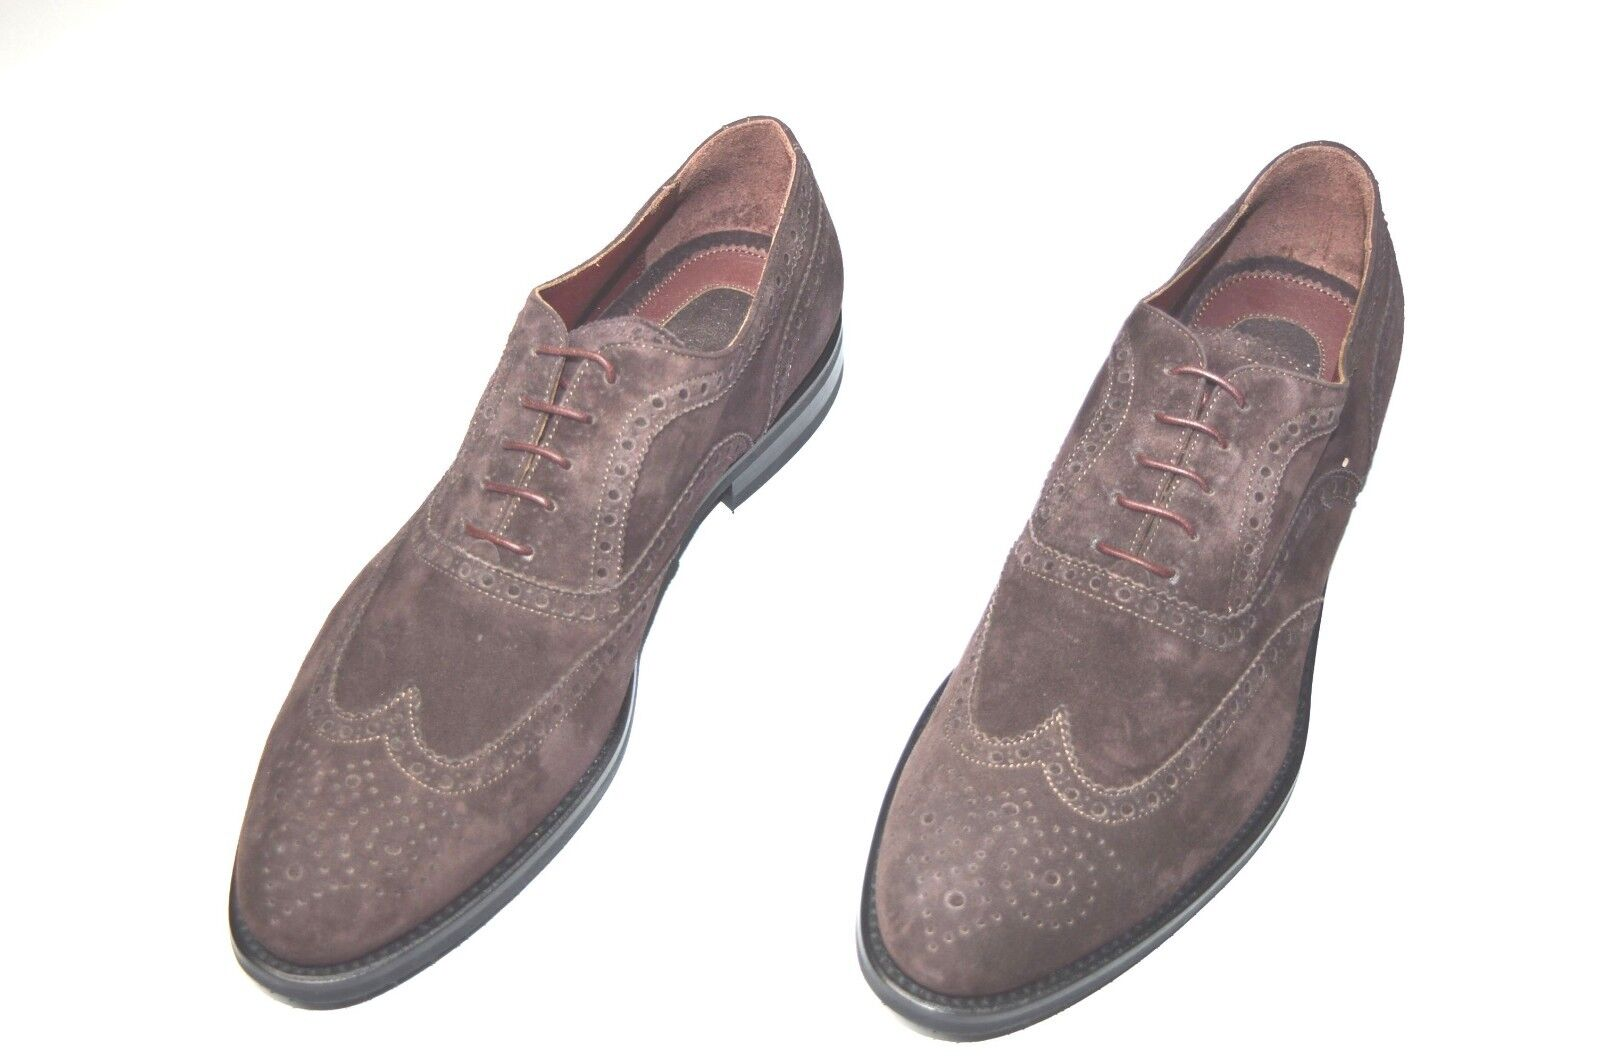 Nuevo Stefano Ricci Zapatos Talla nos 7.5 (COD A345)